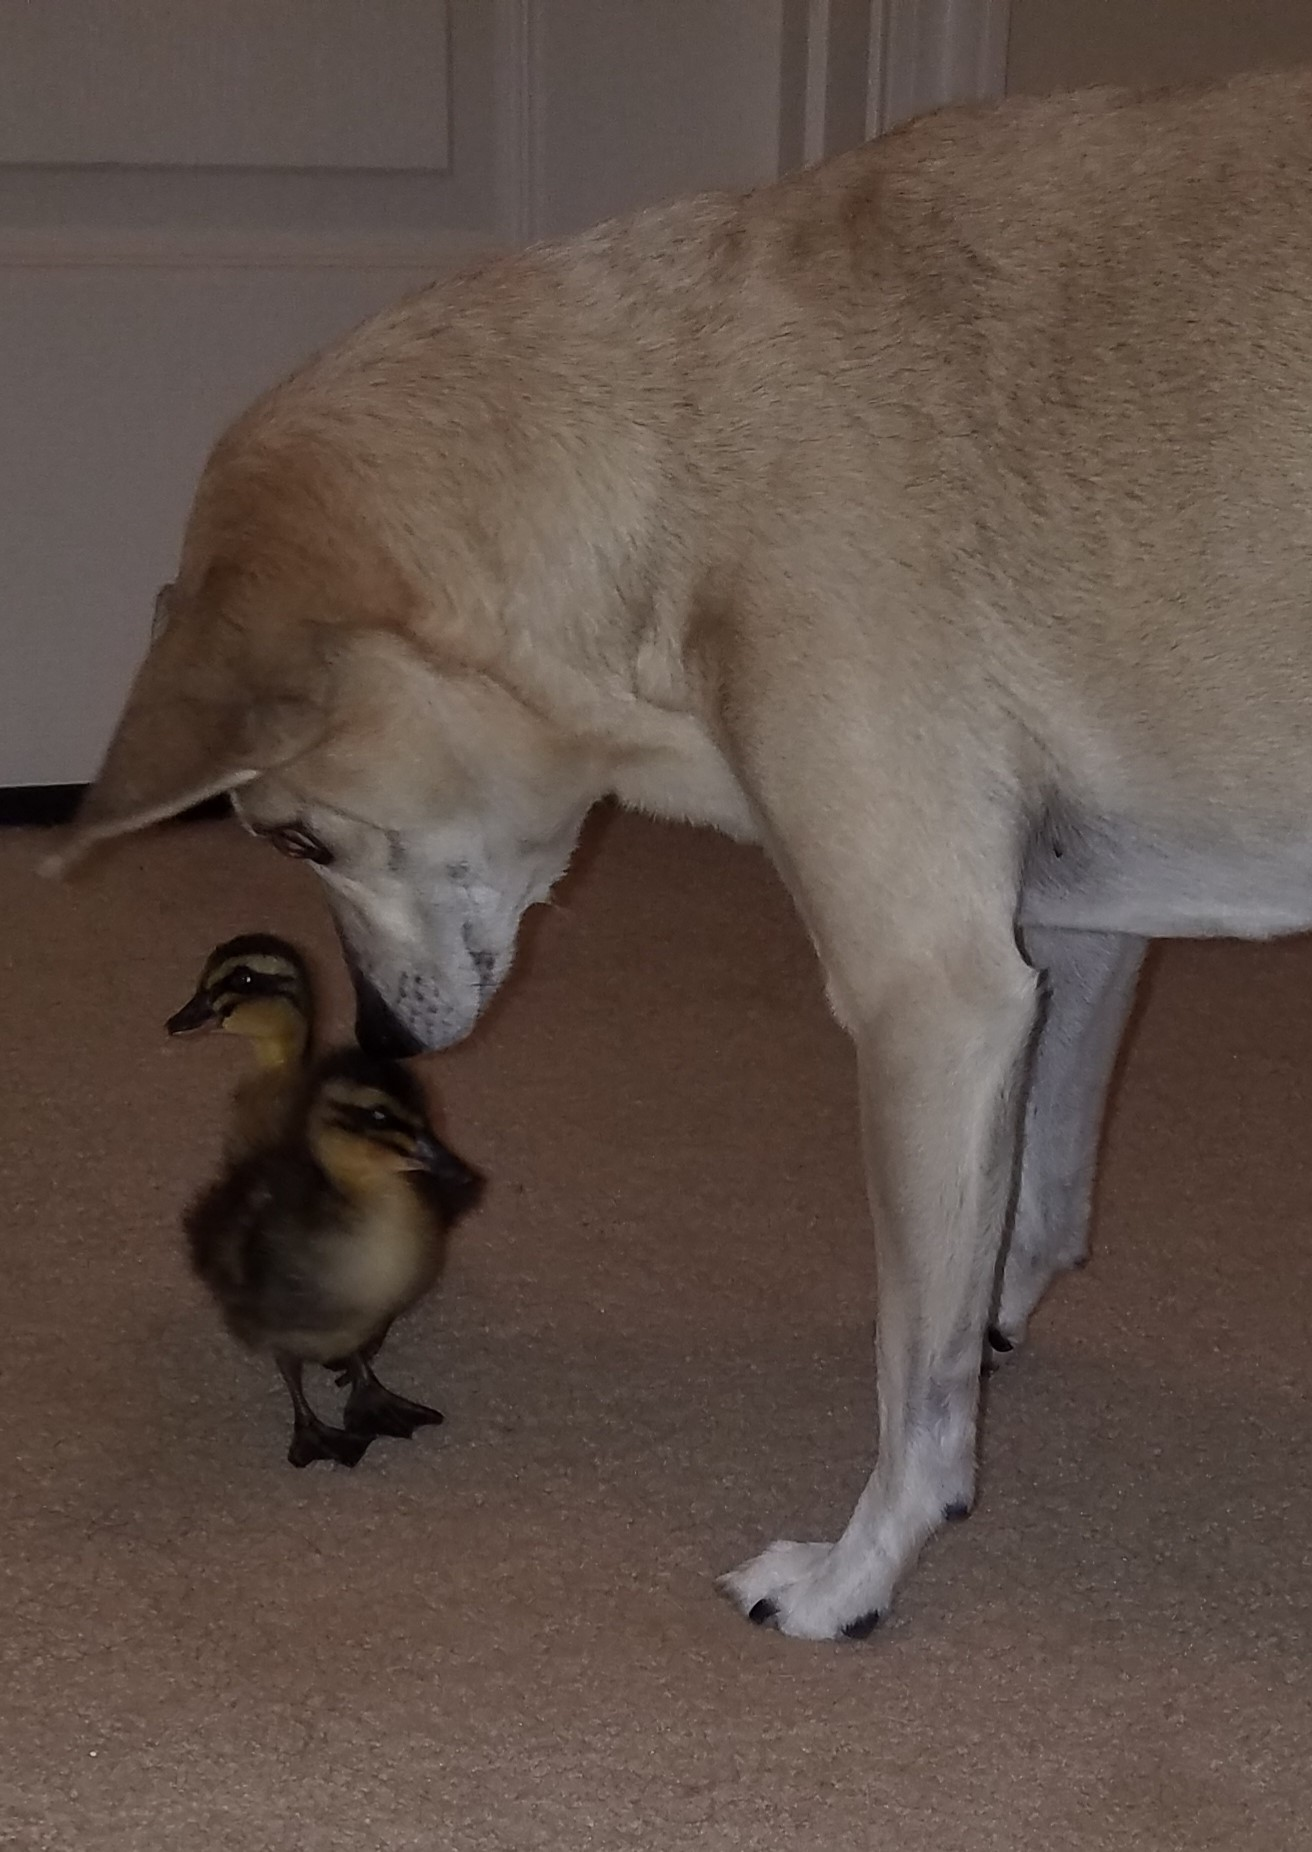 chico with ducks.jpg